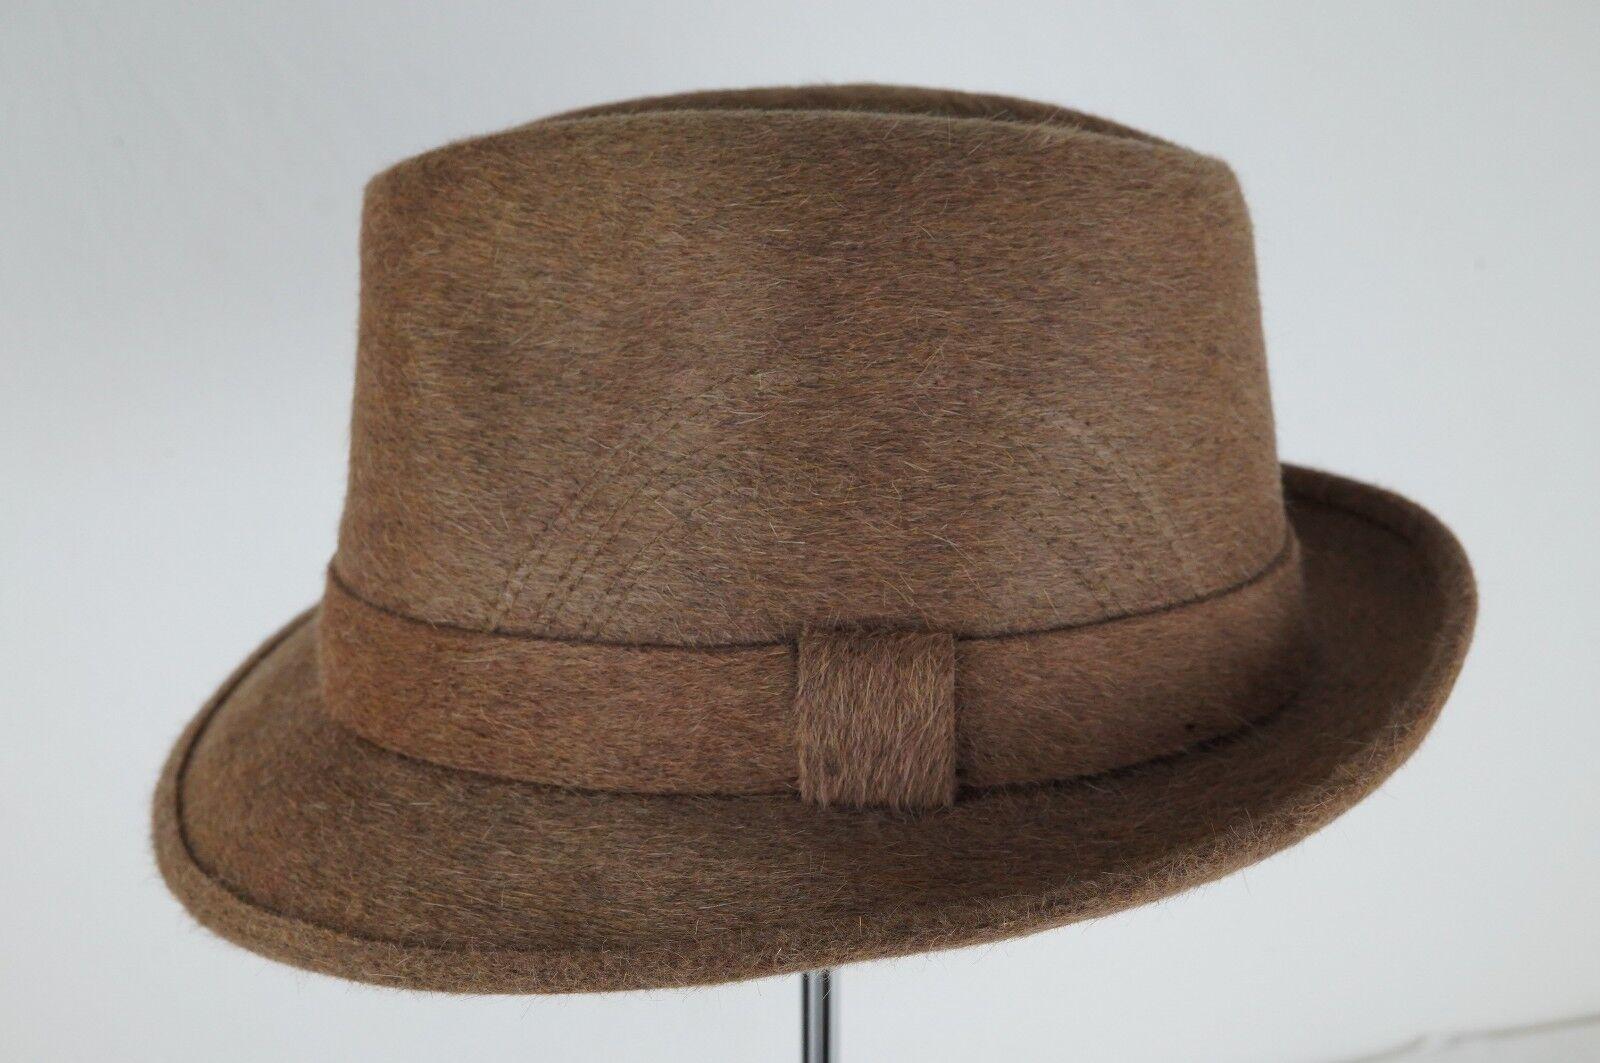 Original Vintage Charles Hatters Hat Plain Fur Felt Fedora braun Größe 60 | Primäre Qualität